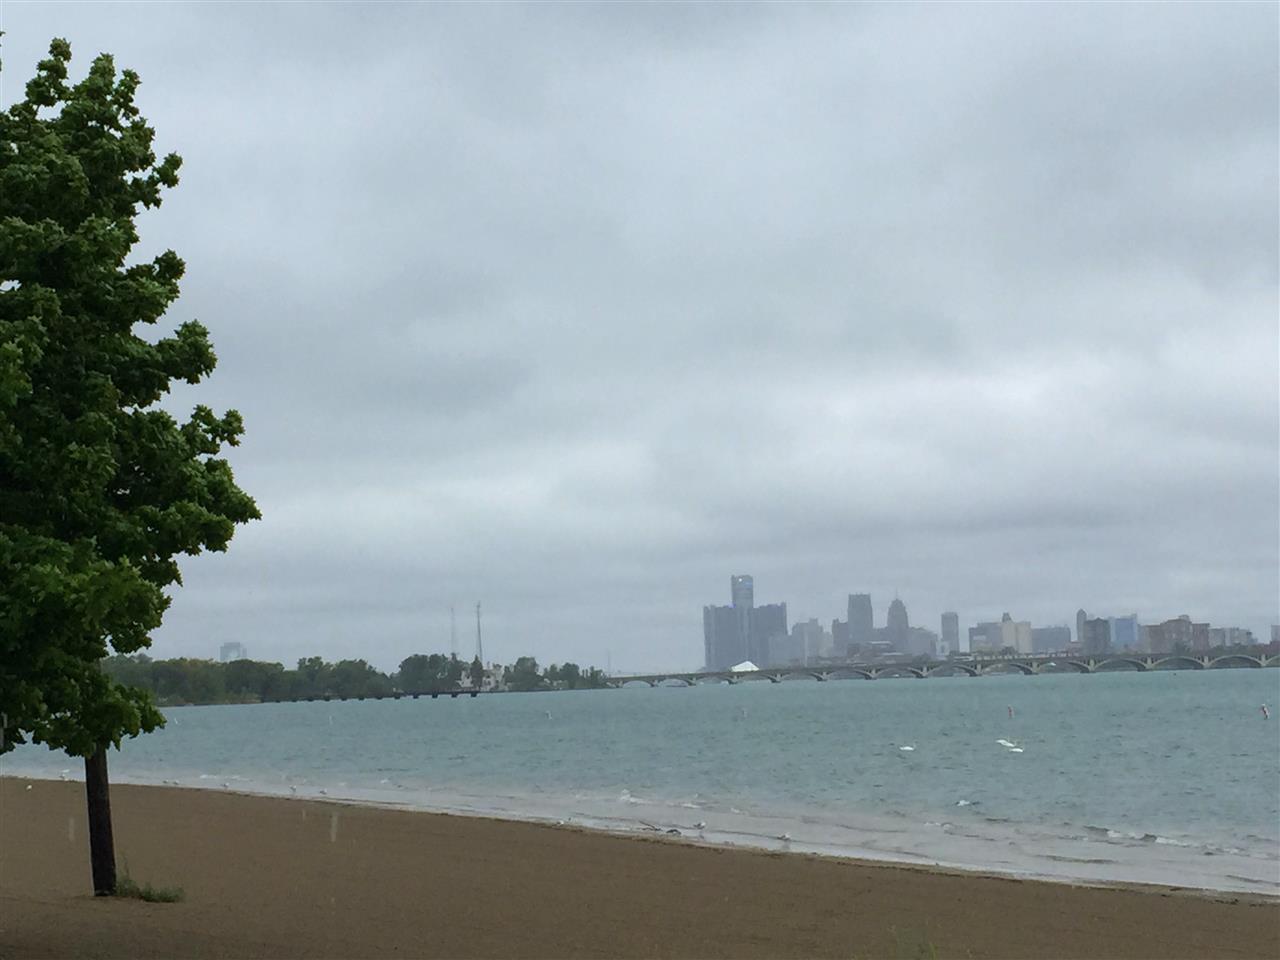 Rainy day Detroit skyline from Belle Isle~ Detroit, Michigan #LeadingRElocal #Detroit, #Michigan